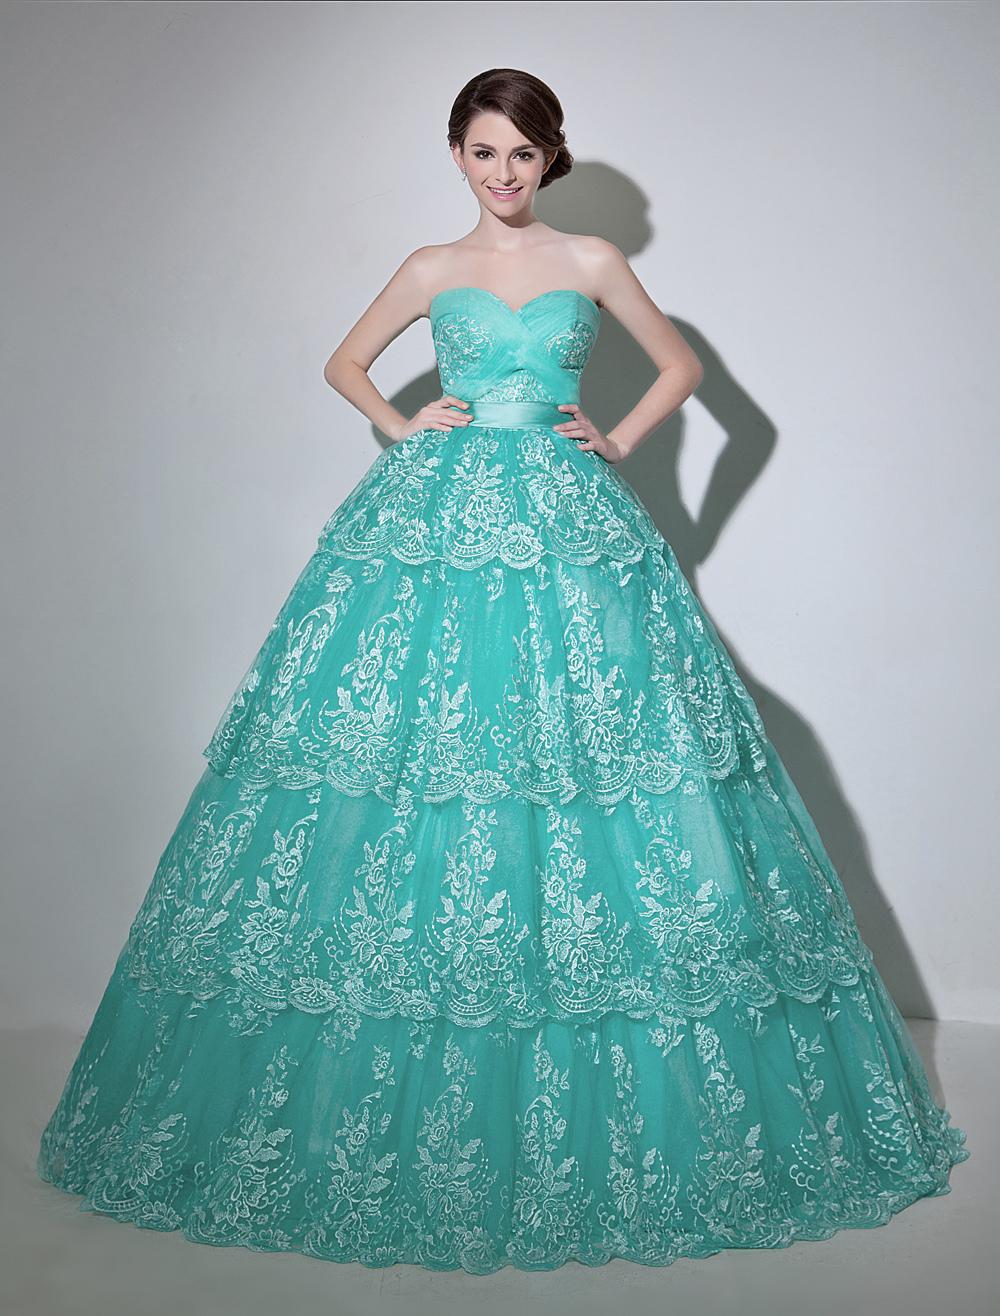 Turquoise Ball Wedding Dress